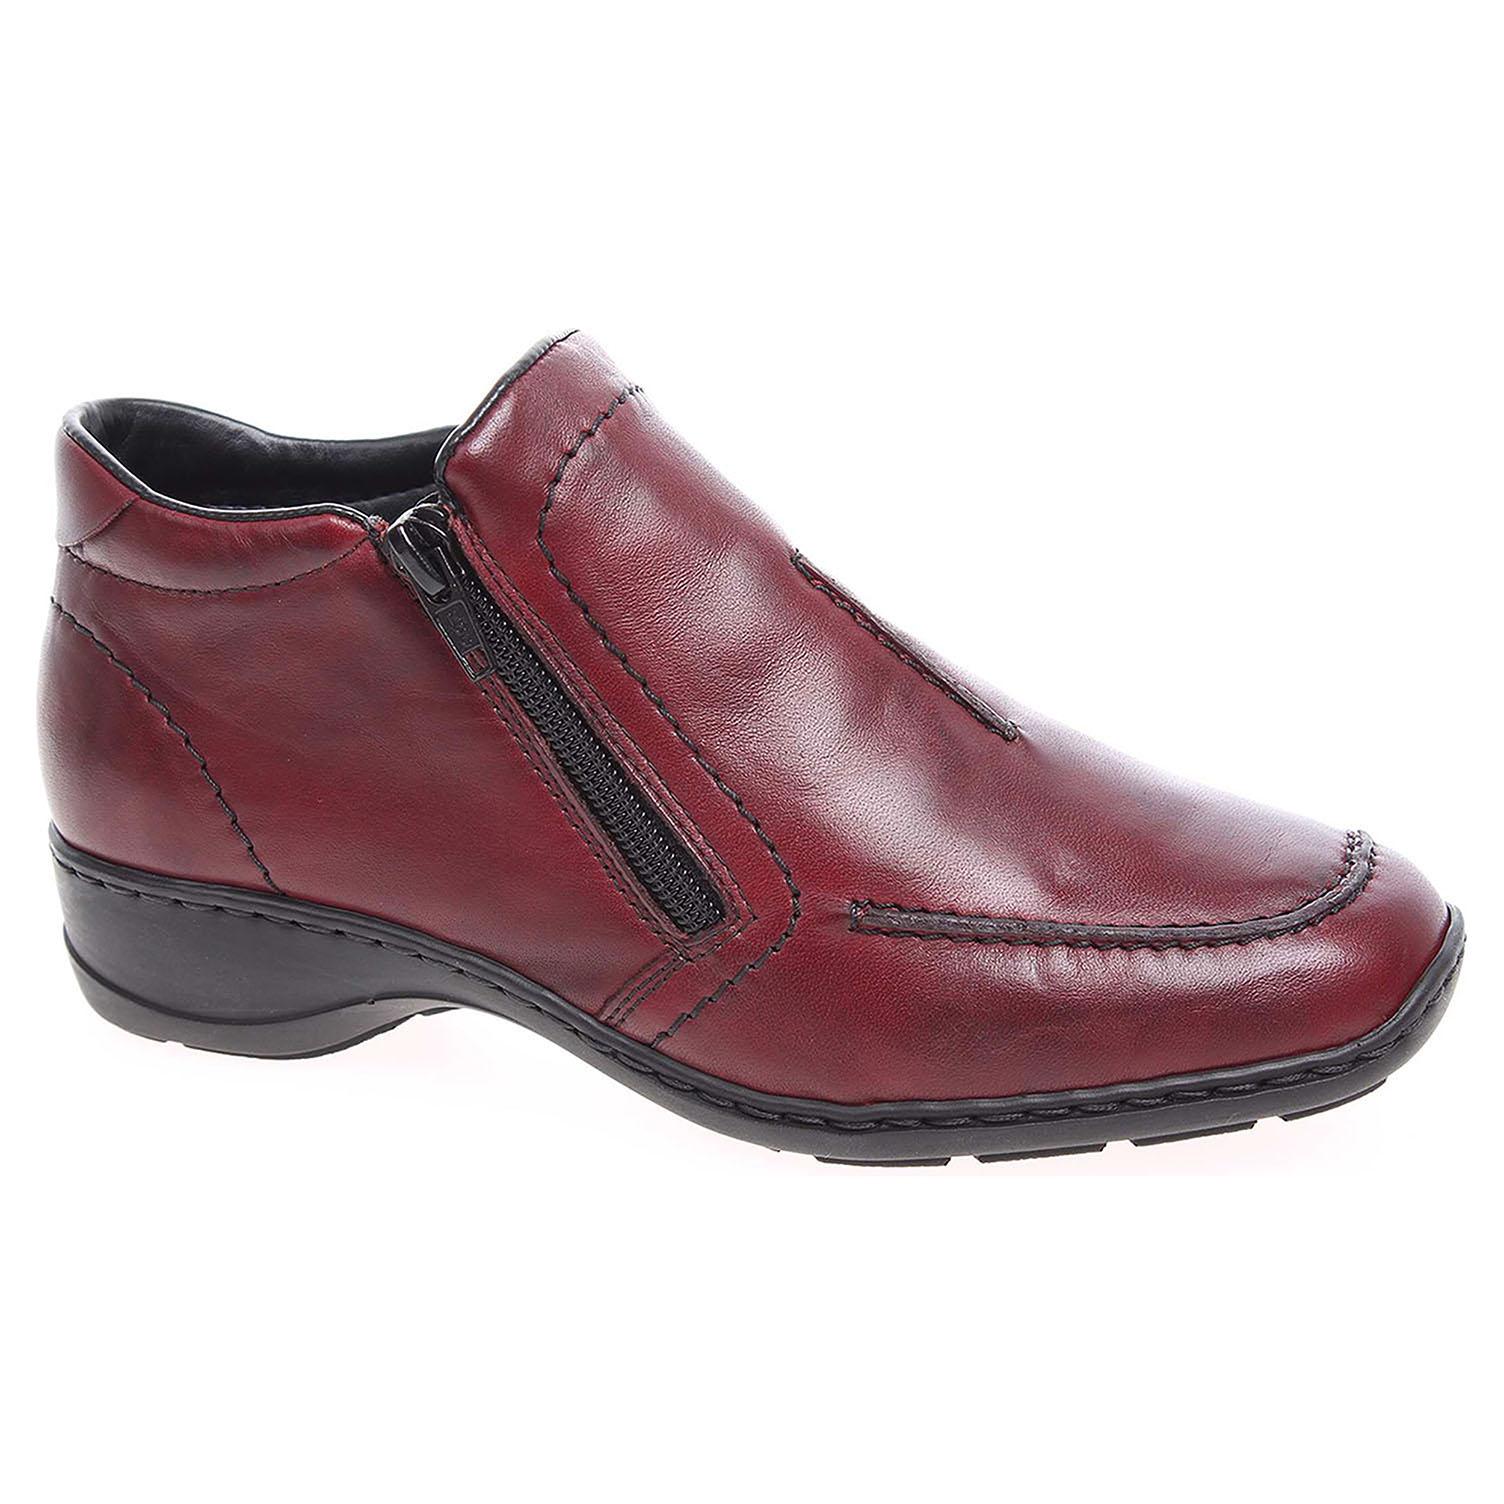 5f8562f552 detail Dámska topánky Rieker 58386-35 rot